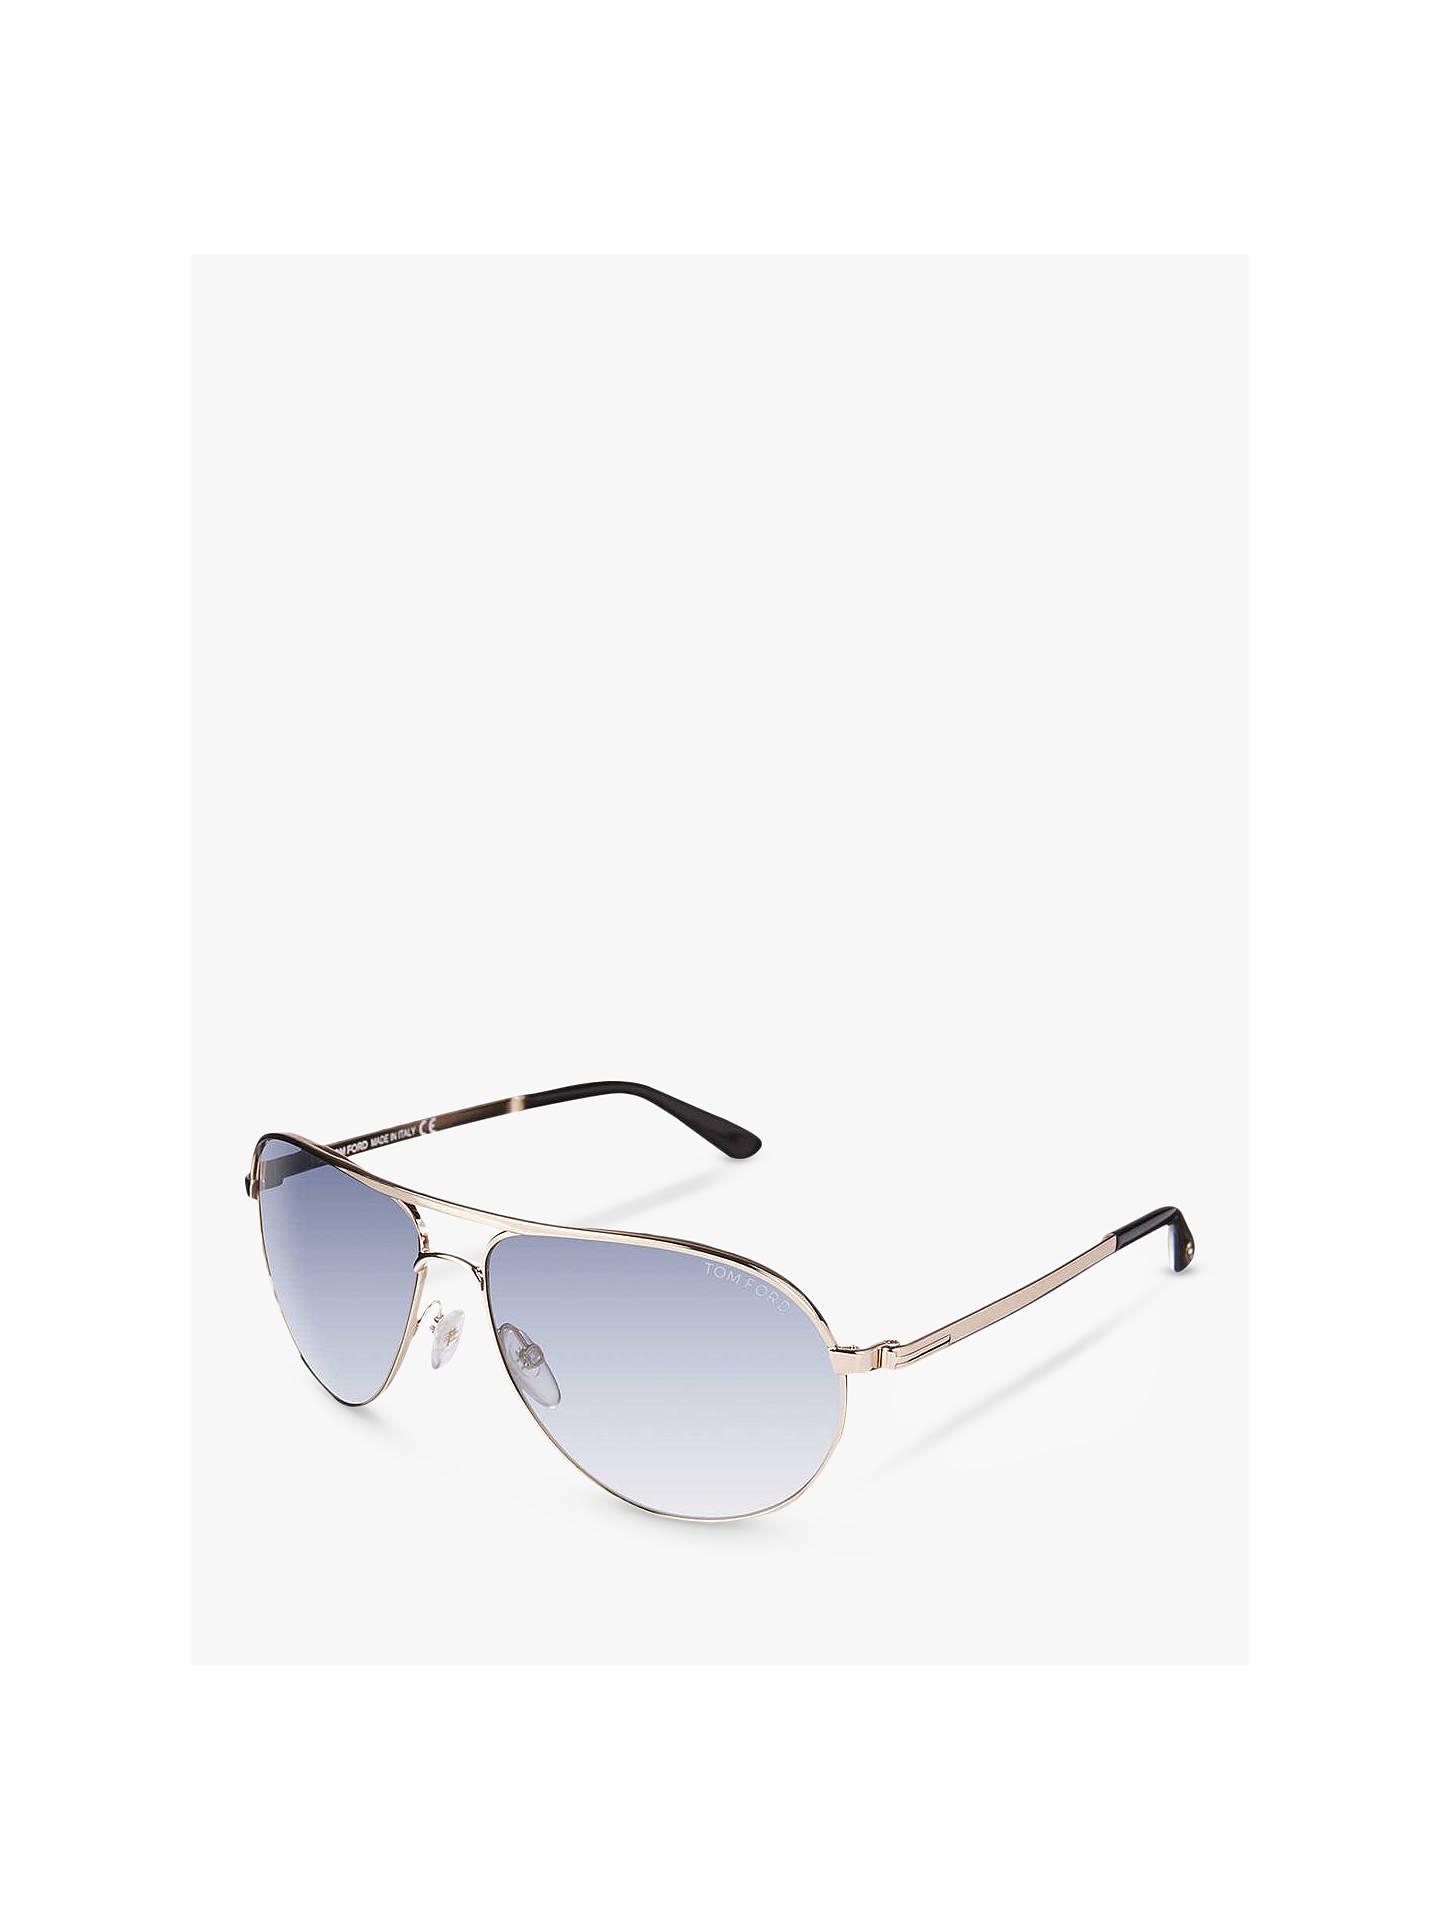 7b1fccea2856d Buy TOM FORD FT0144 Marko Aviator Sunglasses